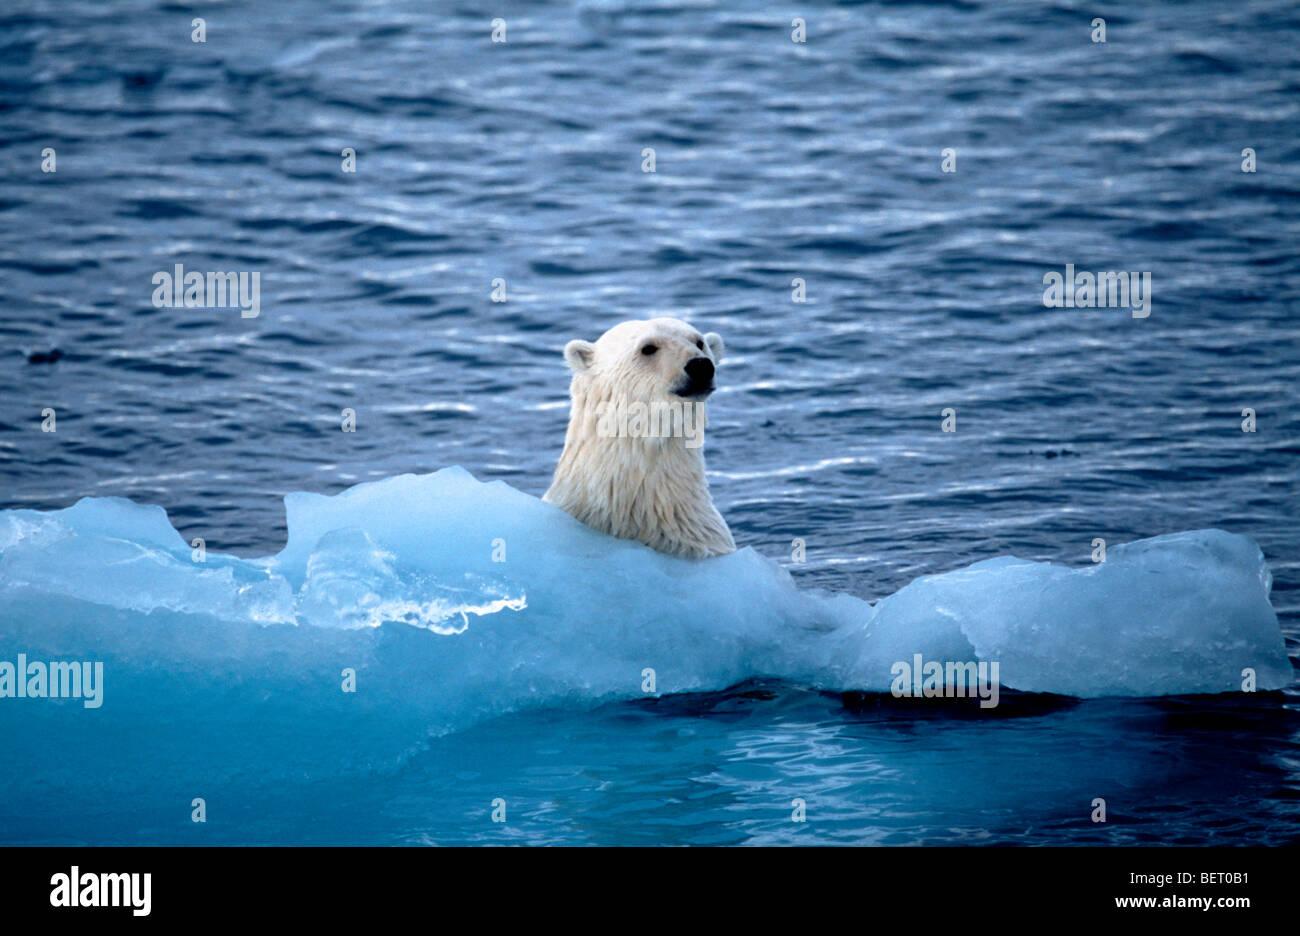 Polar bear swimming in ocean - photo#44